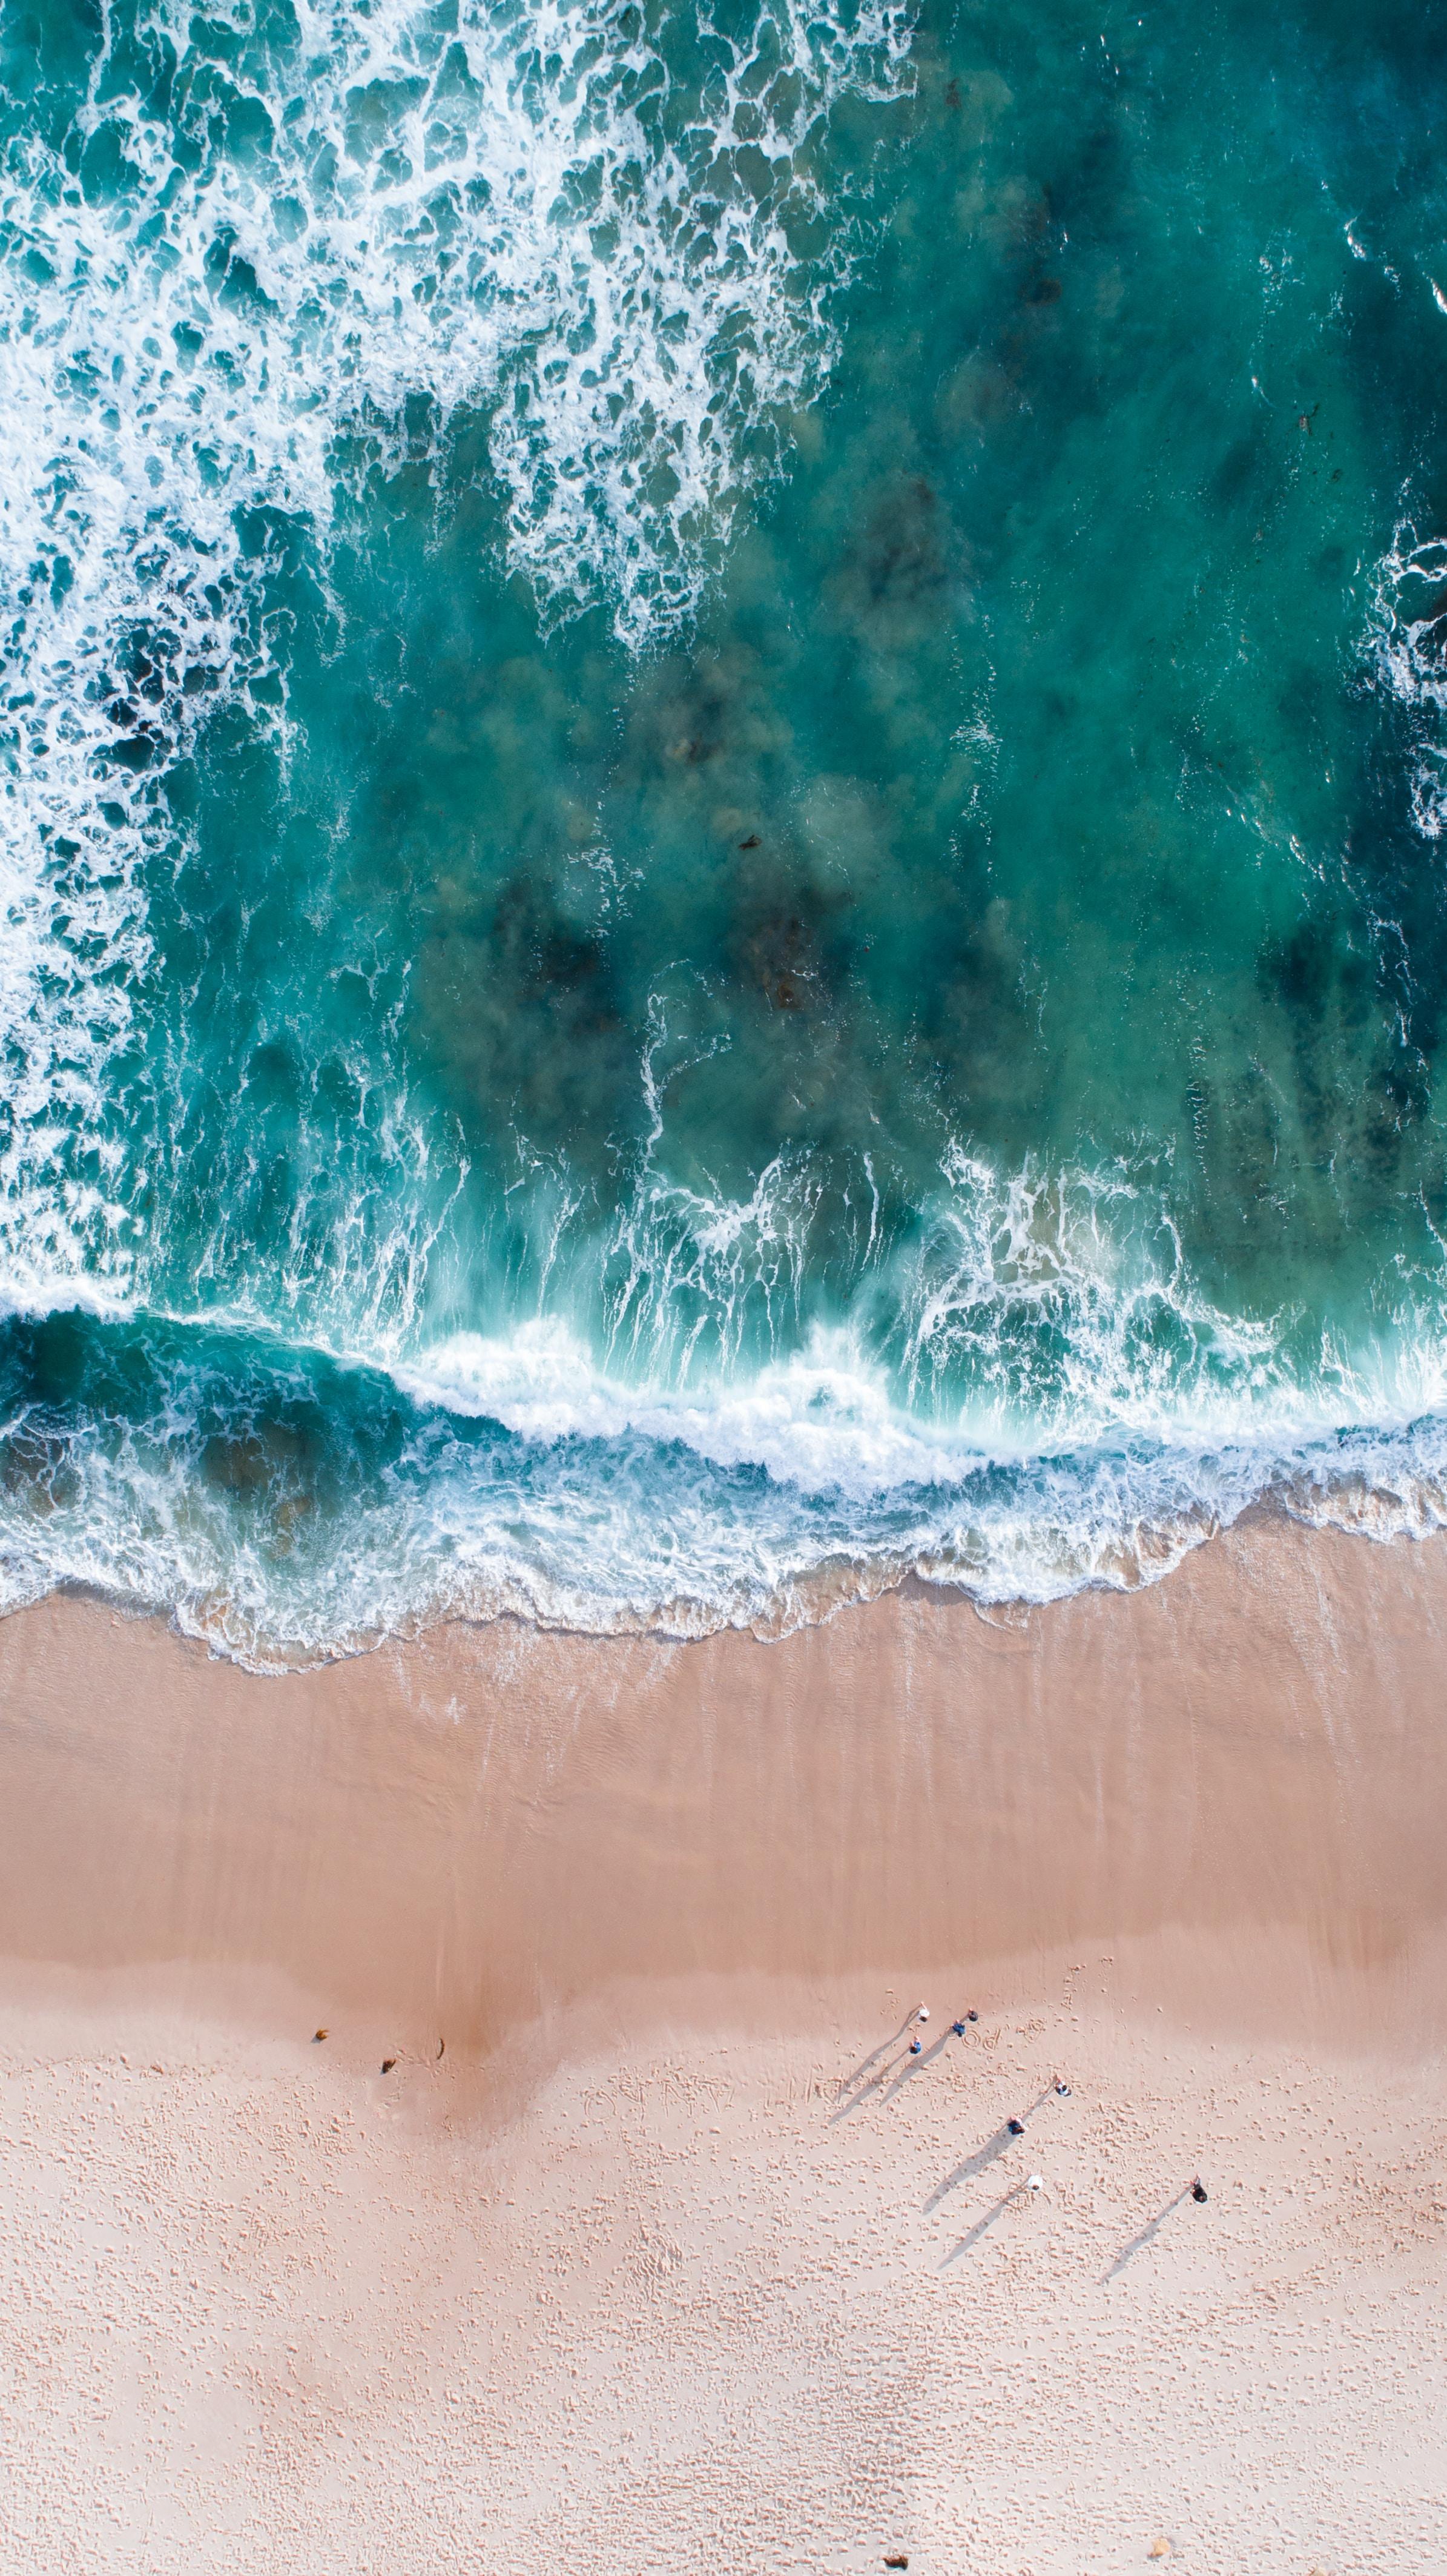 bird's-eye view photography of seashore